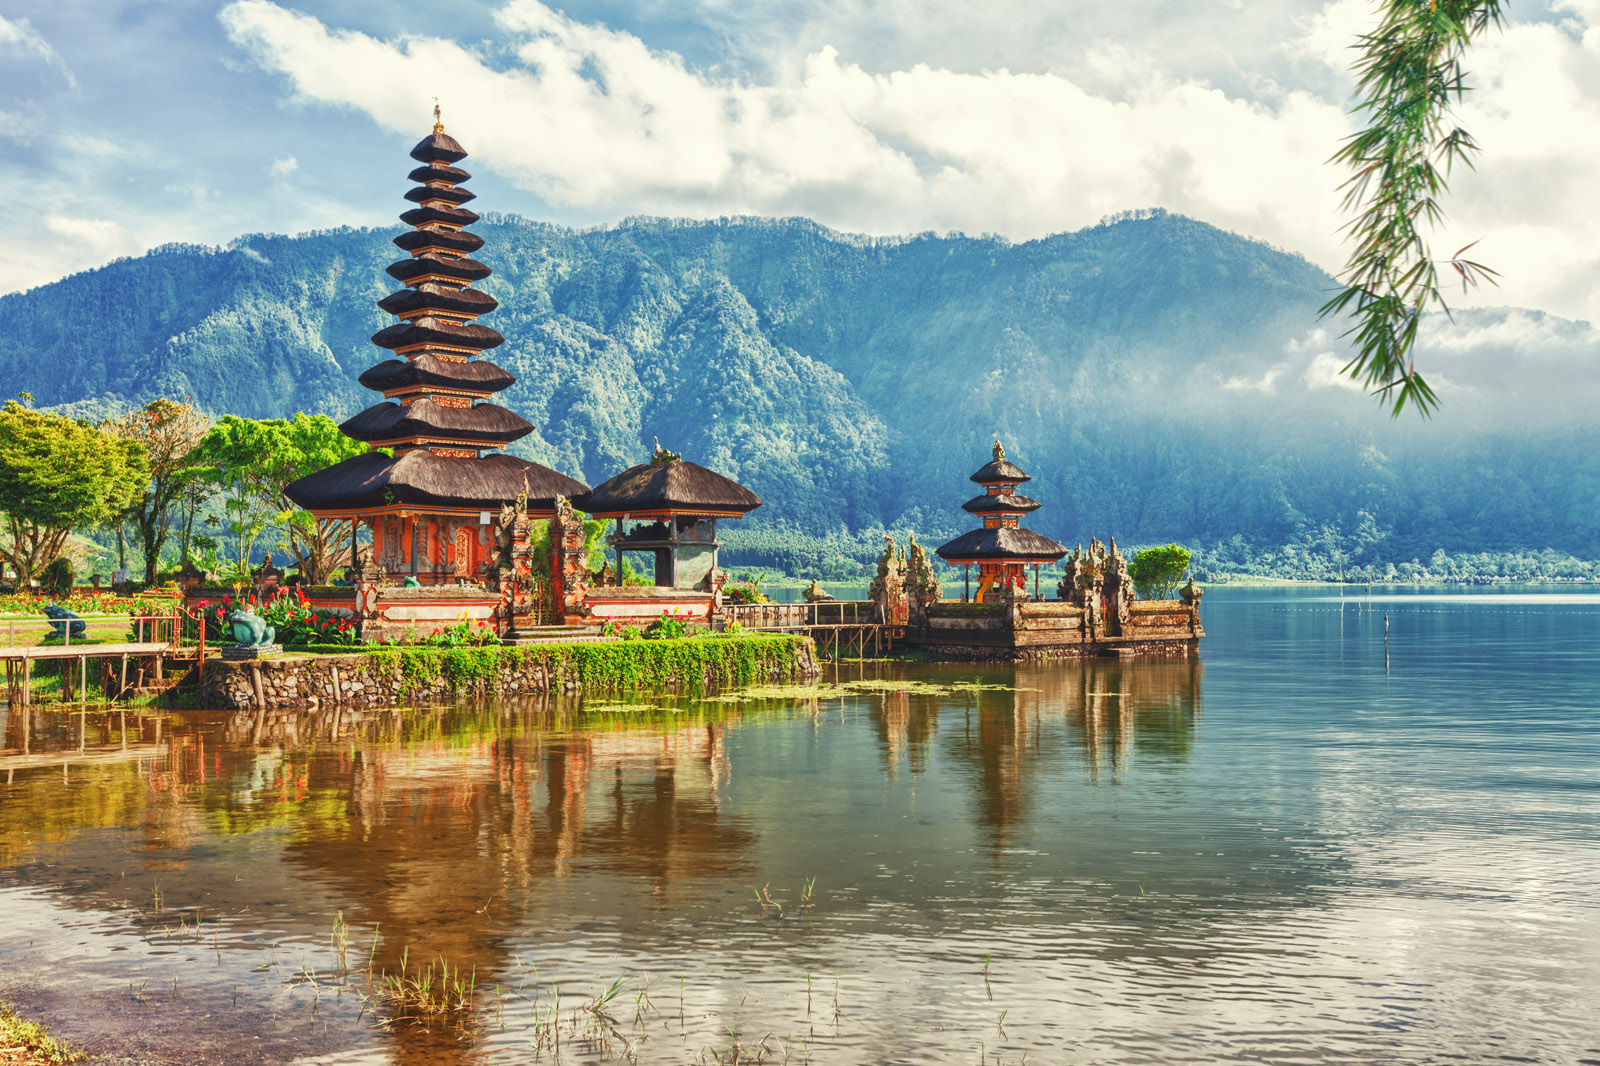 Why Bali Is An Addictive Travel Destination